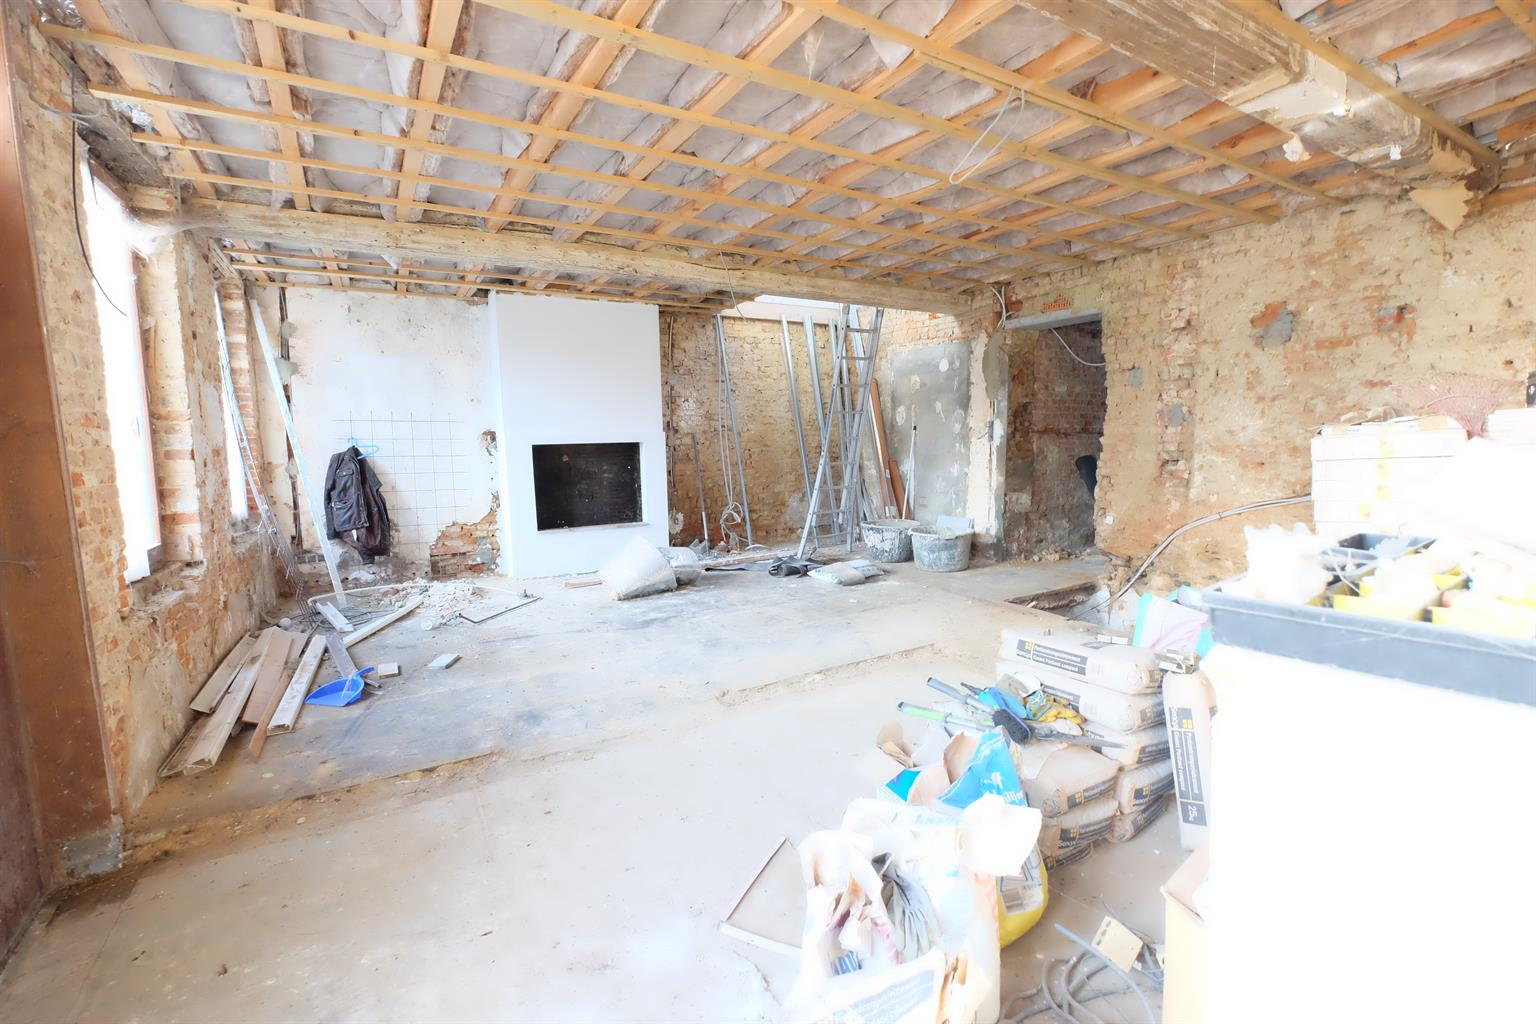 Maison - Tubize Oisquercq - #4398600-1